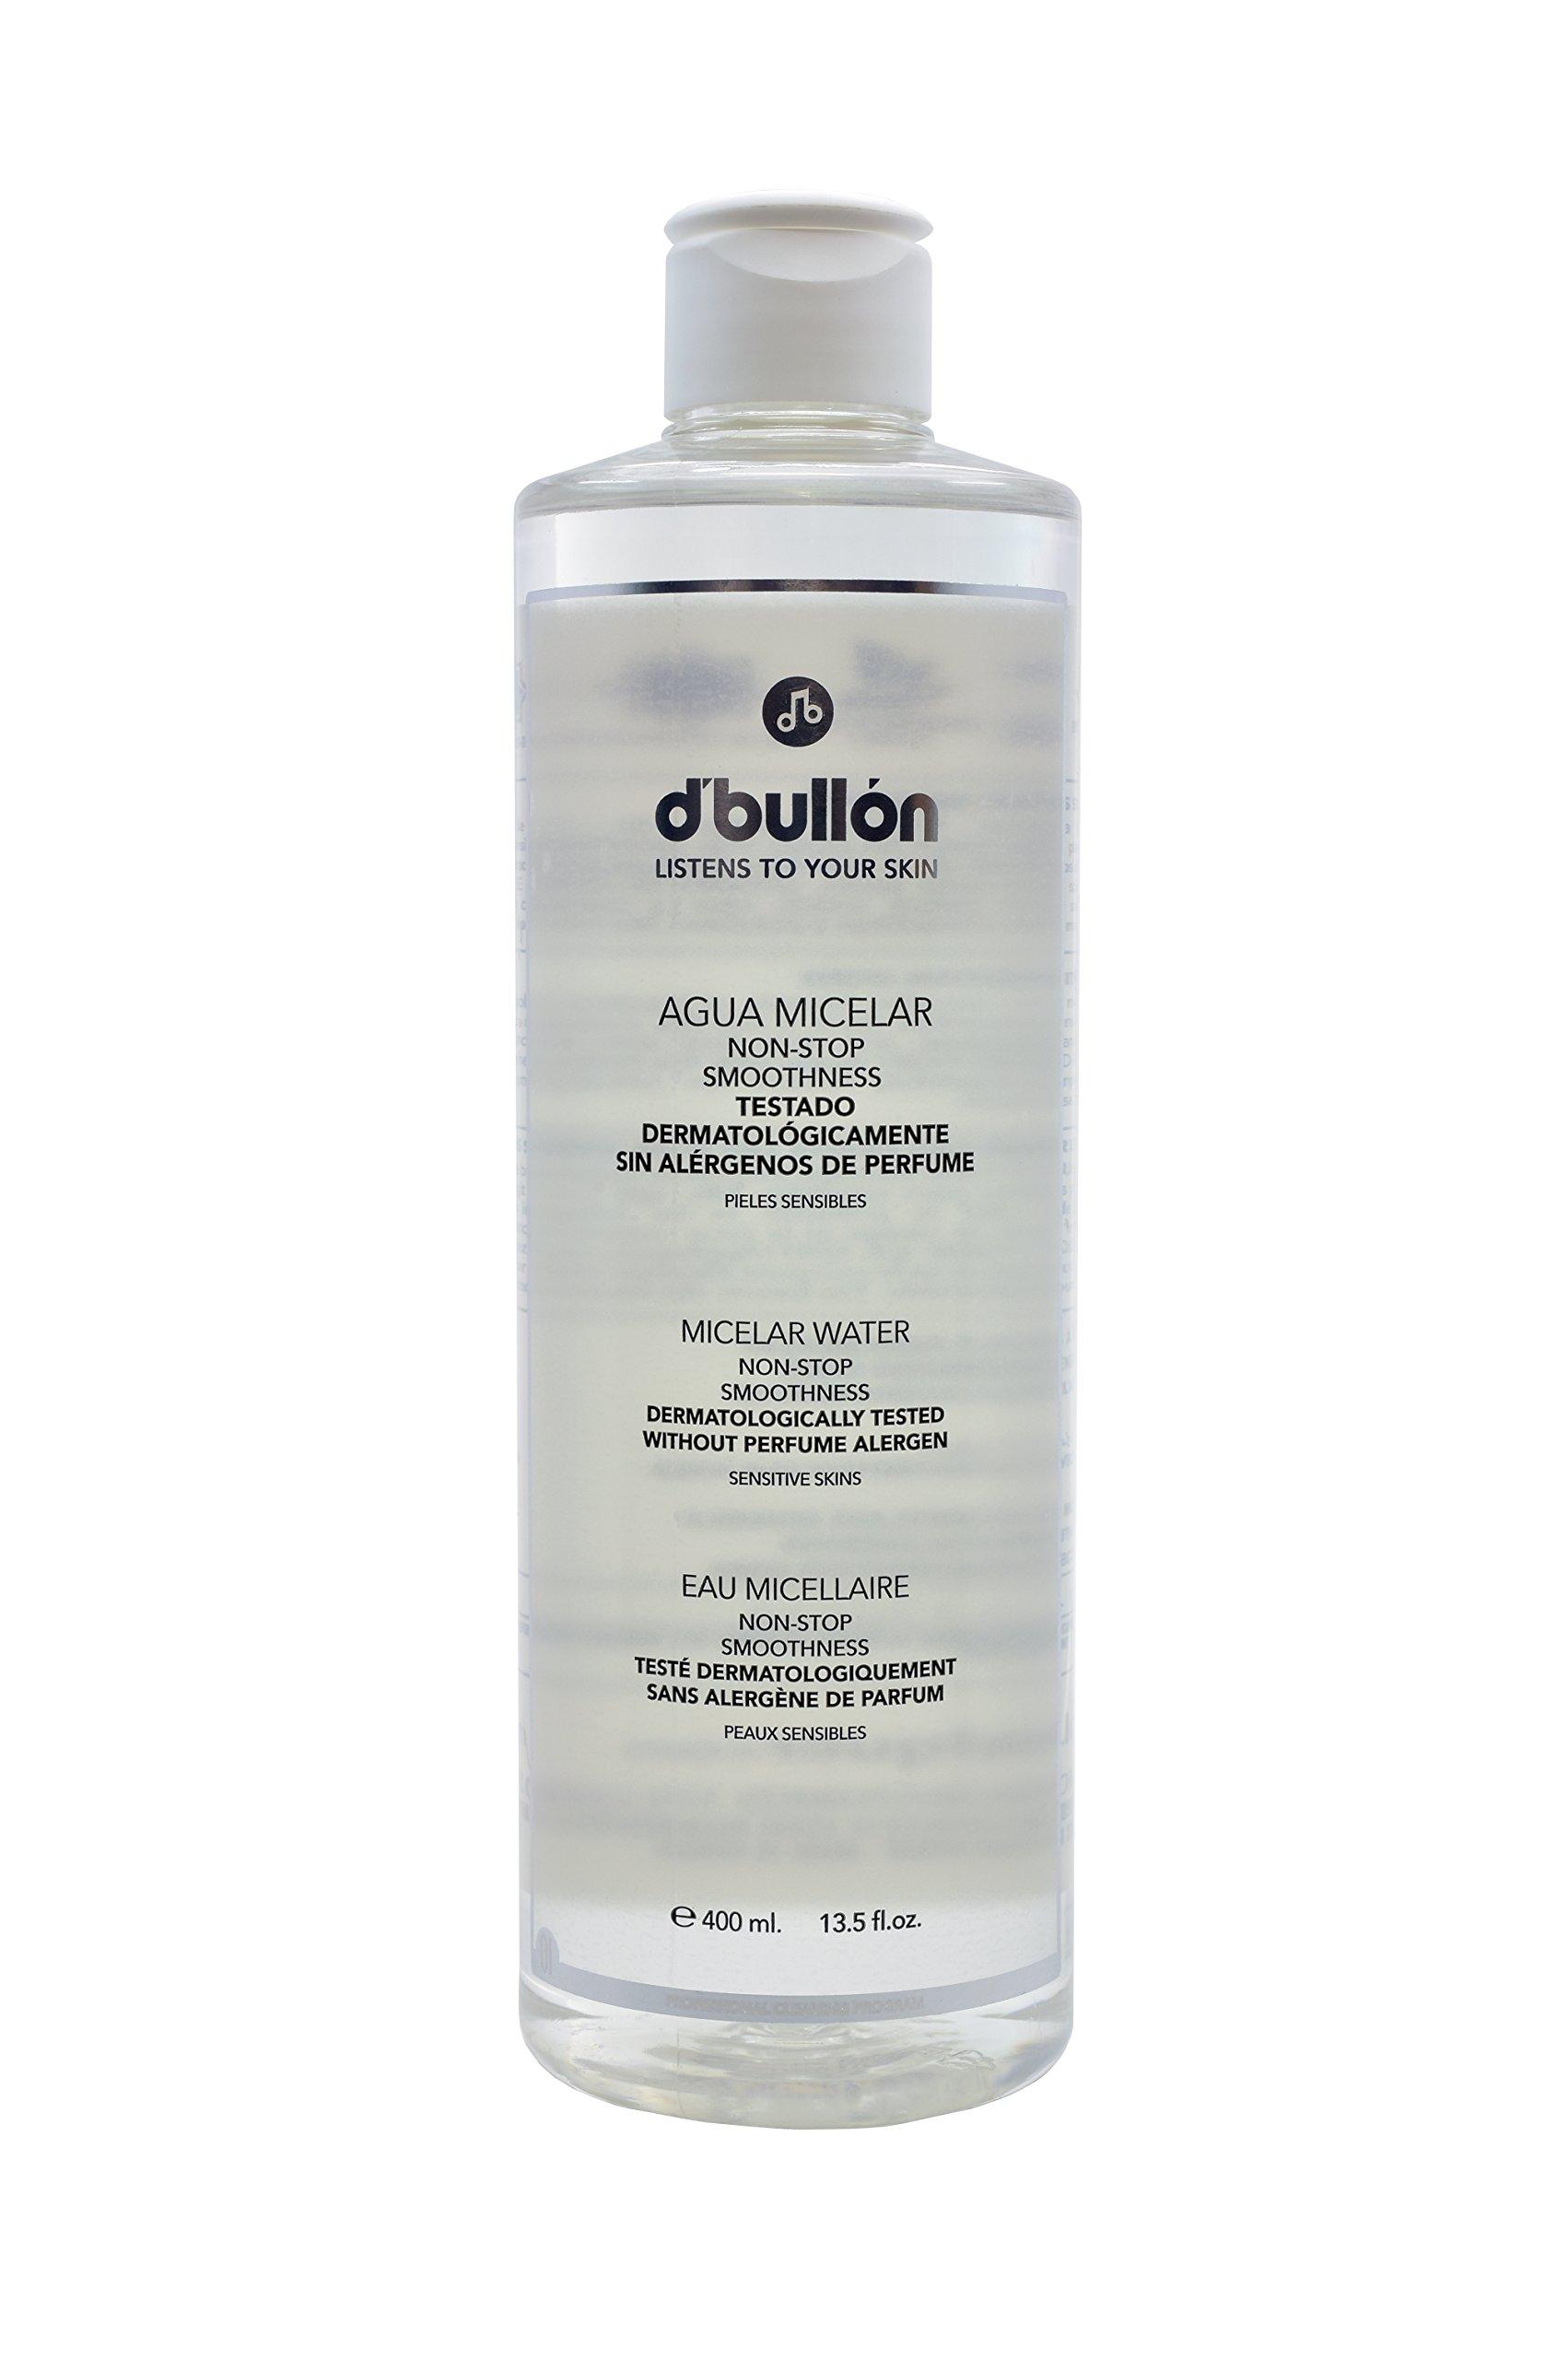 DBullón Agua Micelar para Pieles Sensibles. Desmaquilla y limpia - 400 ml product